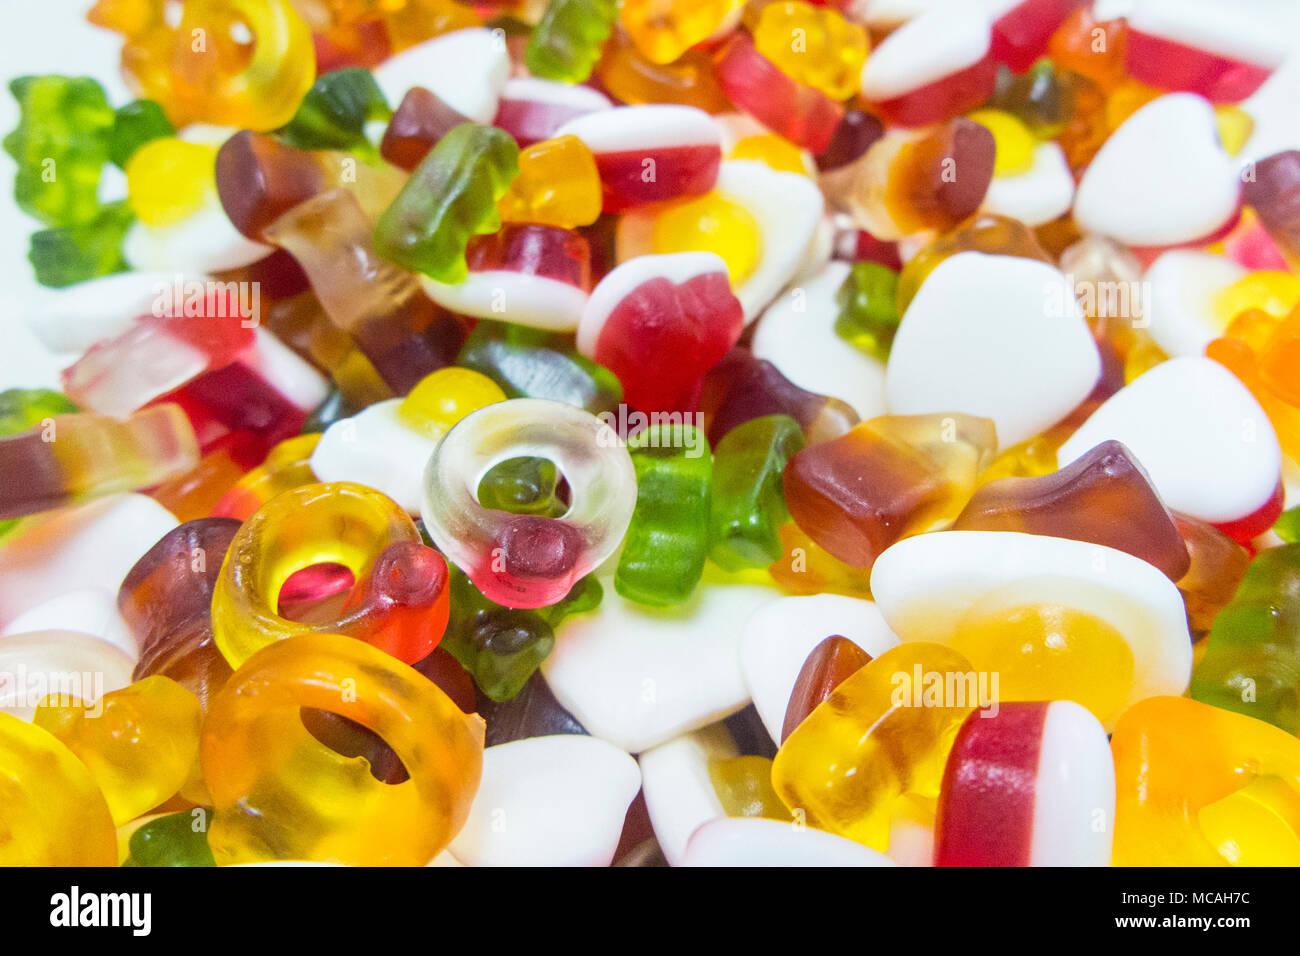 Lots of Haribo sweets - Stock Image